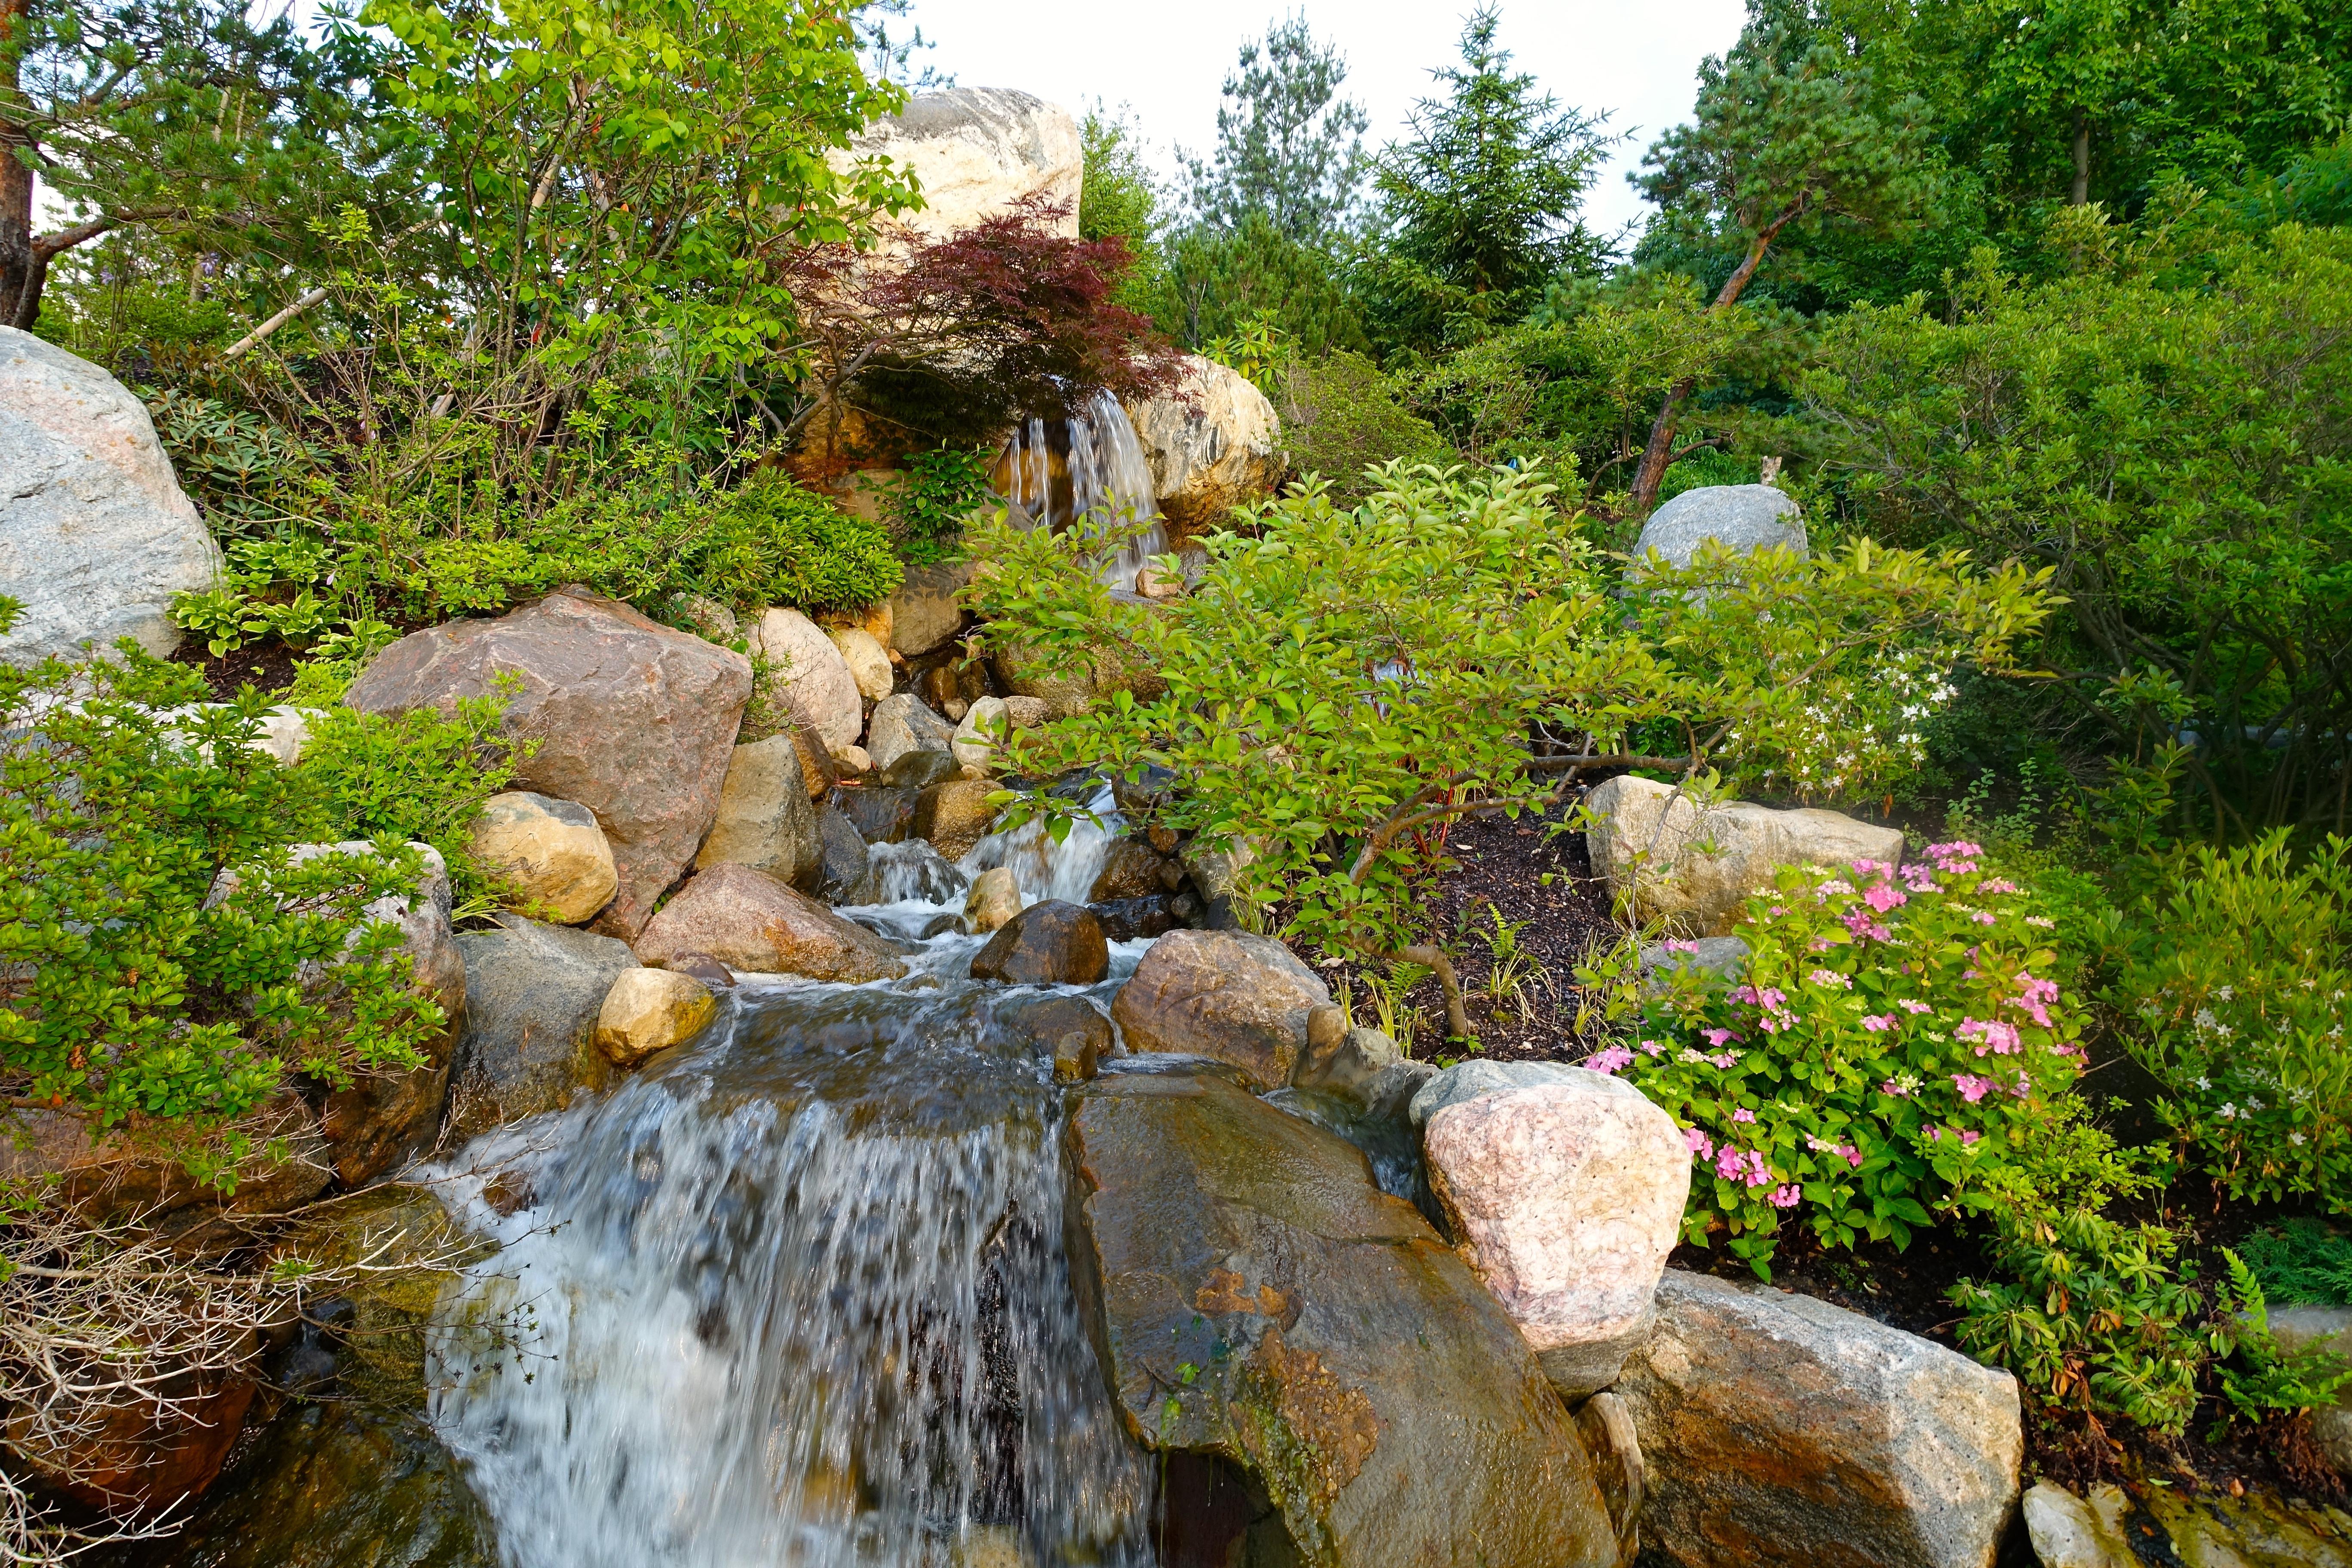 Waterfalls at Meijer Japanese Tea Garden